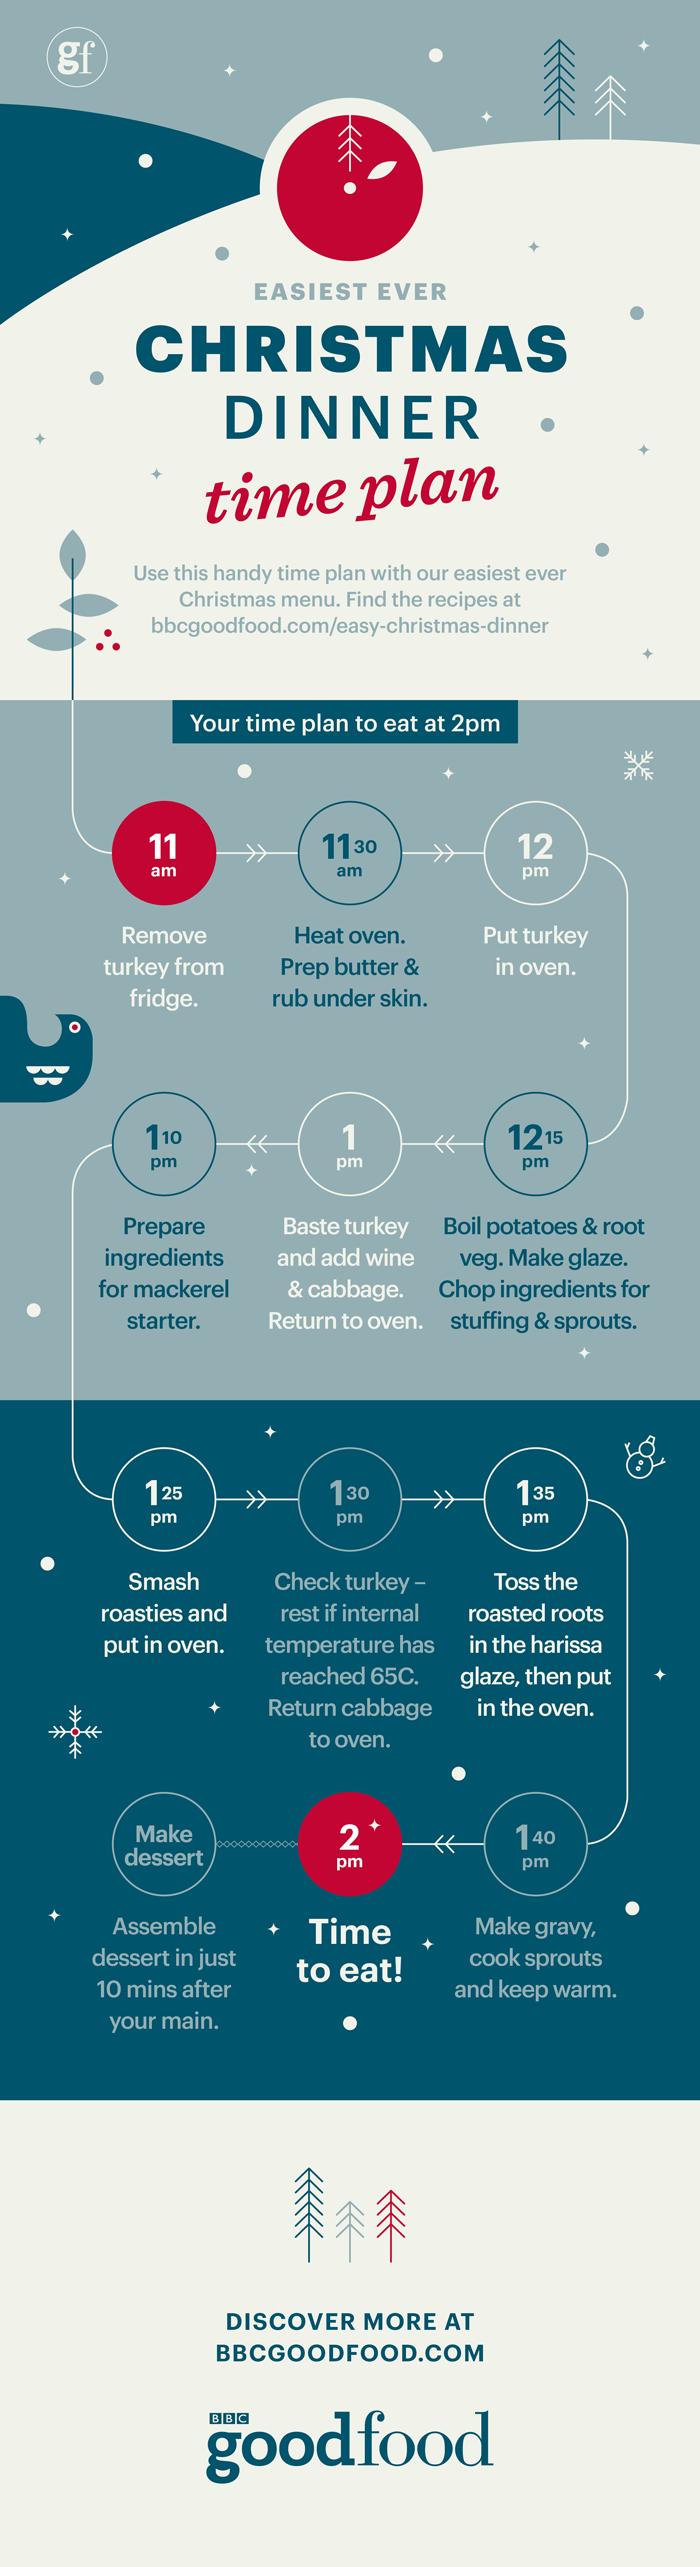 Christmas Dinner Time Plan